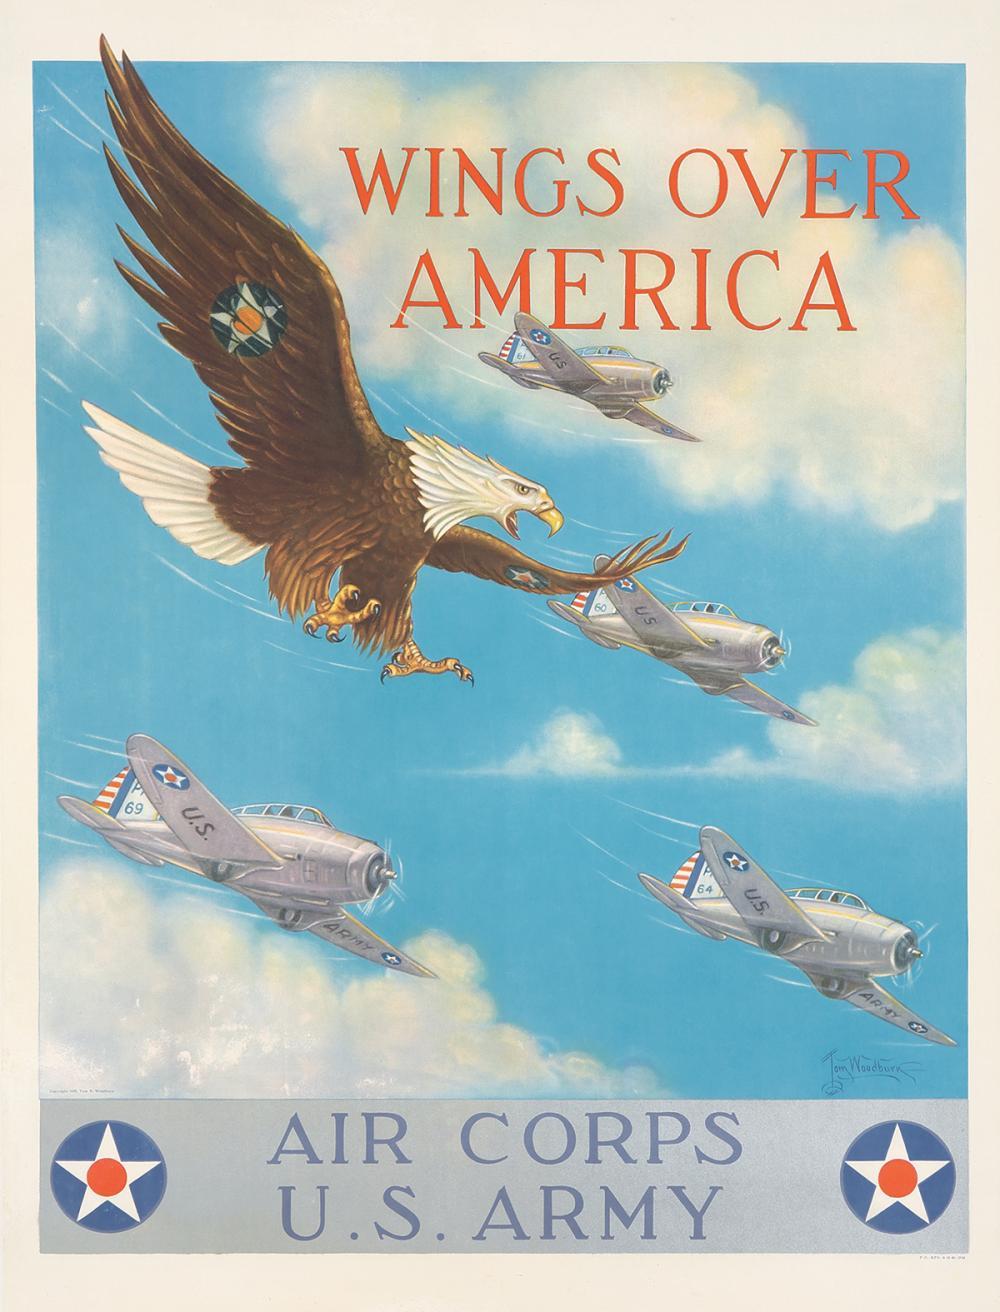 U.S. Army / Wings Over America. 1939.